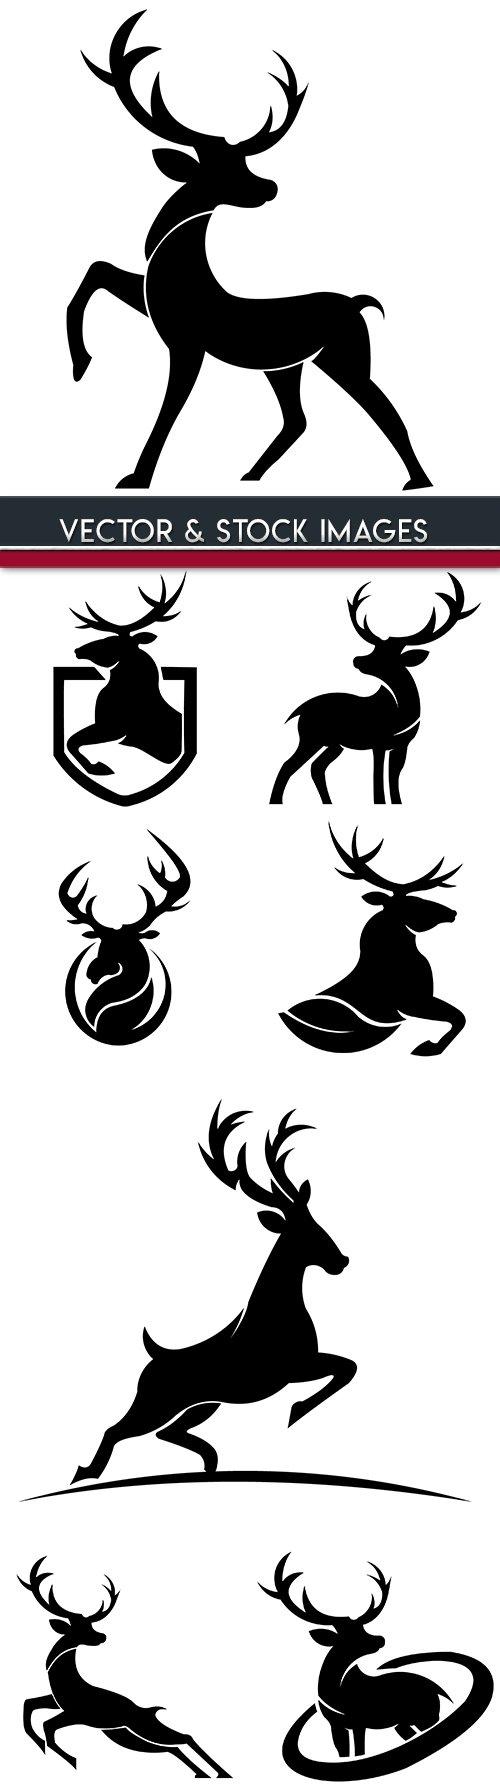 Christmas deer silhouette design illustrations